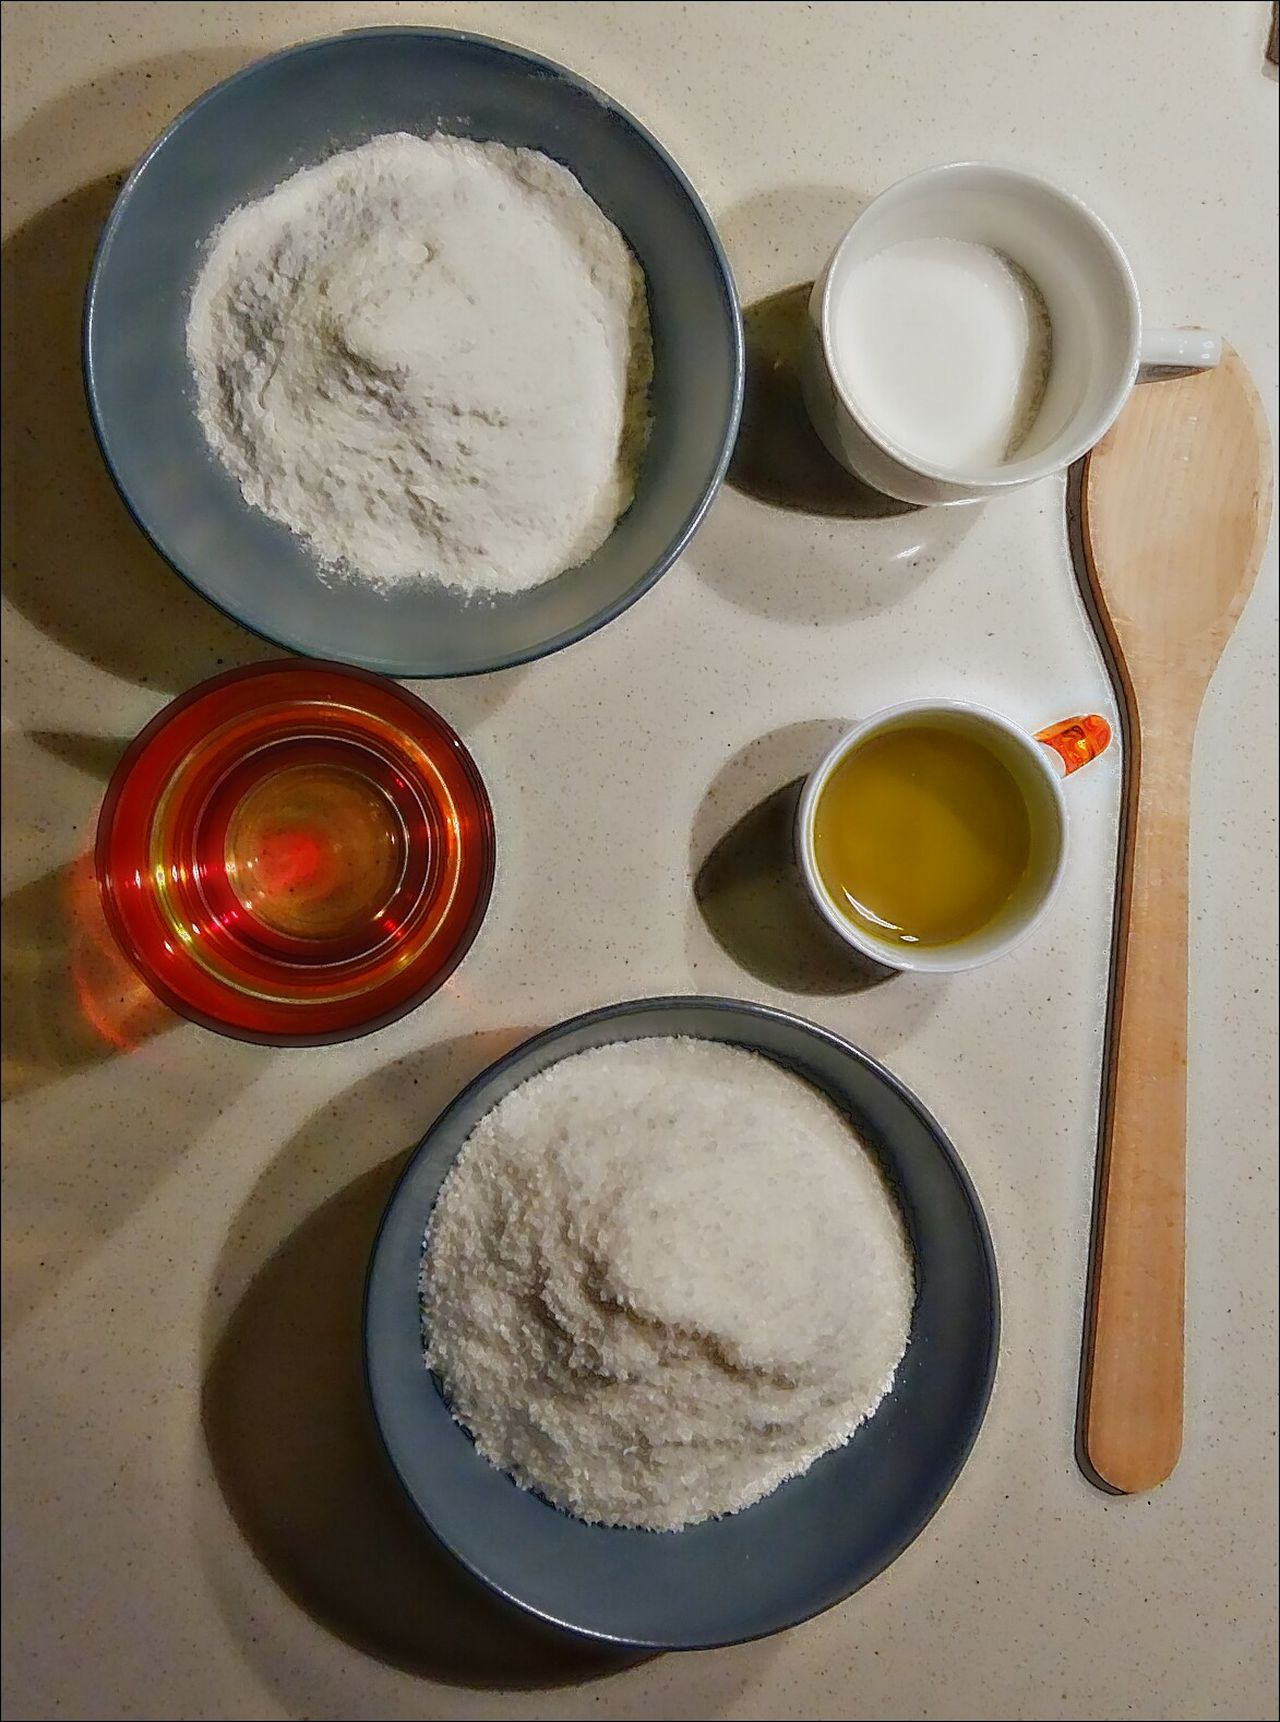 Food Foodphotography Preparing Food Preparing Cake Kitchen Kitchen Utensils Farina Zucchero Glutenfree Cucina Cucinaitaliana Cucinare Preparazione Home Sweet Home Homemade Food